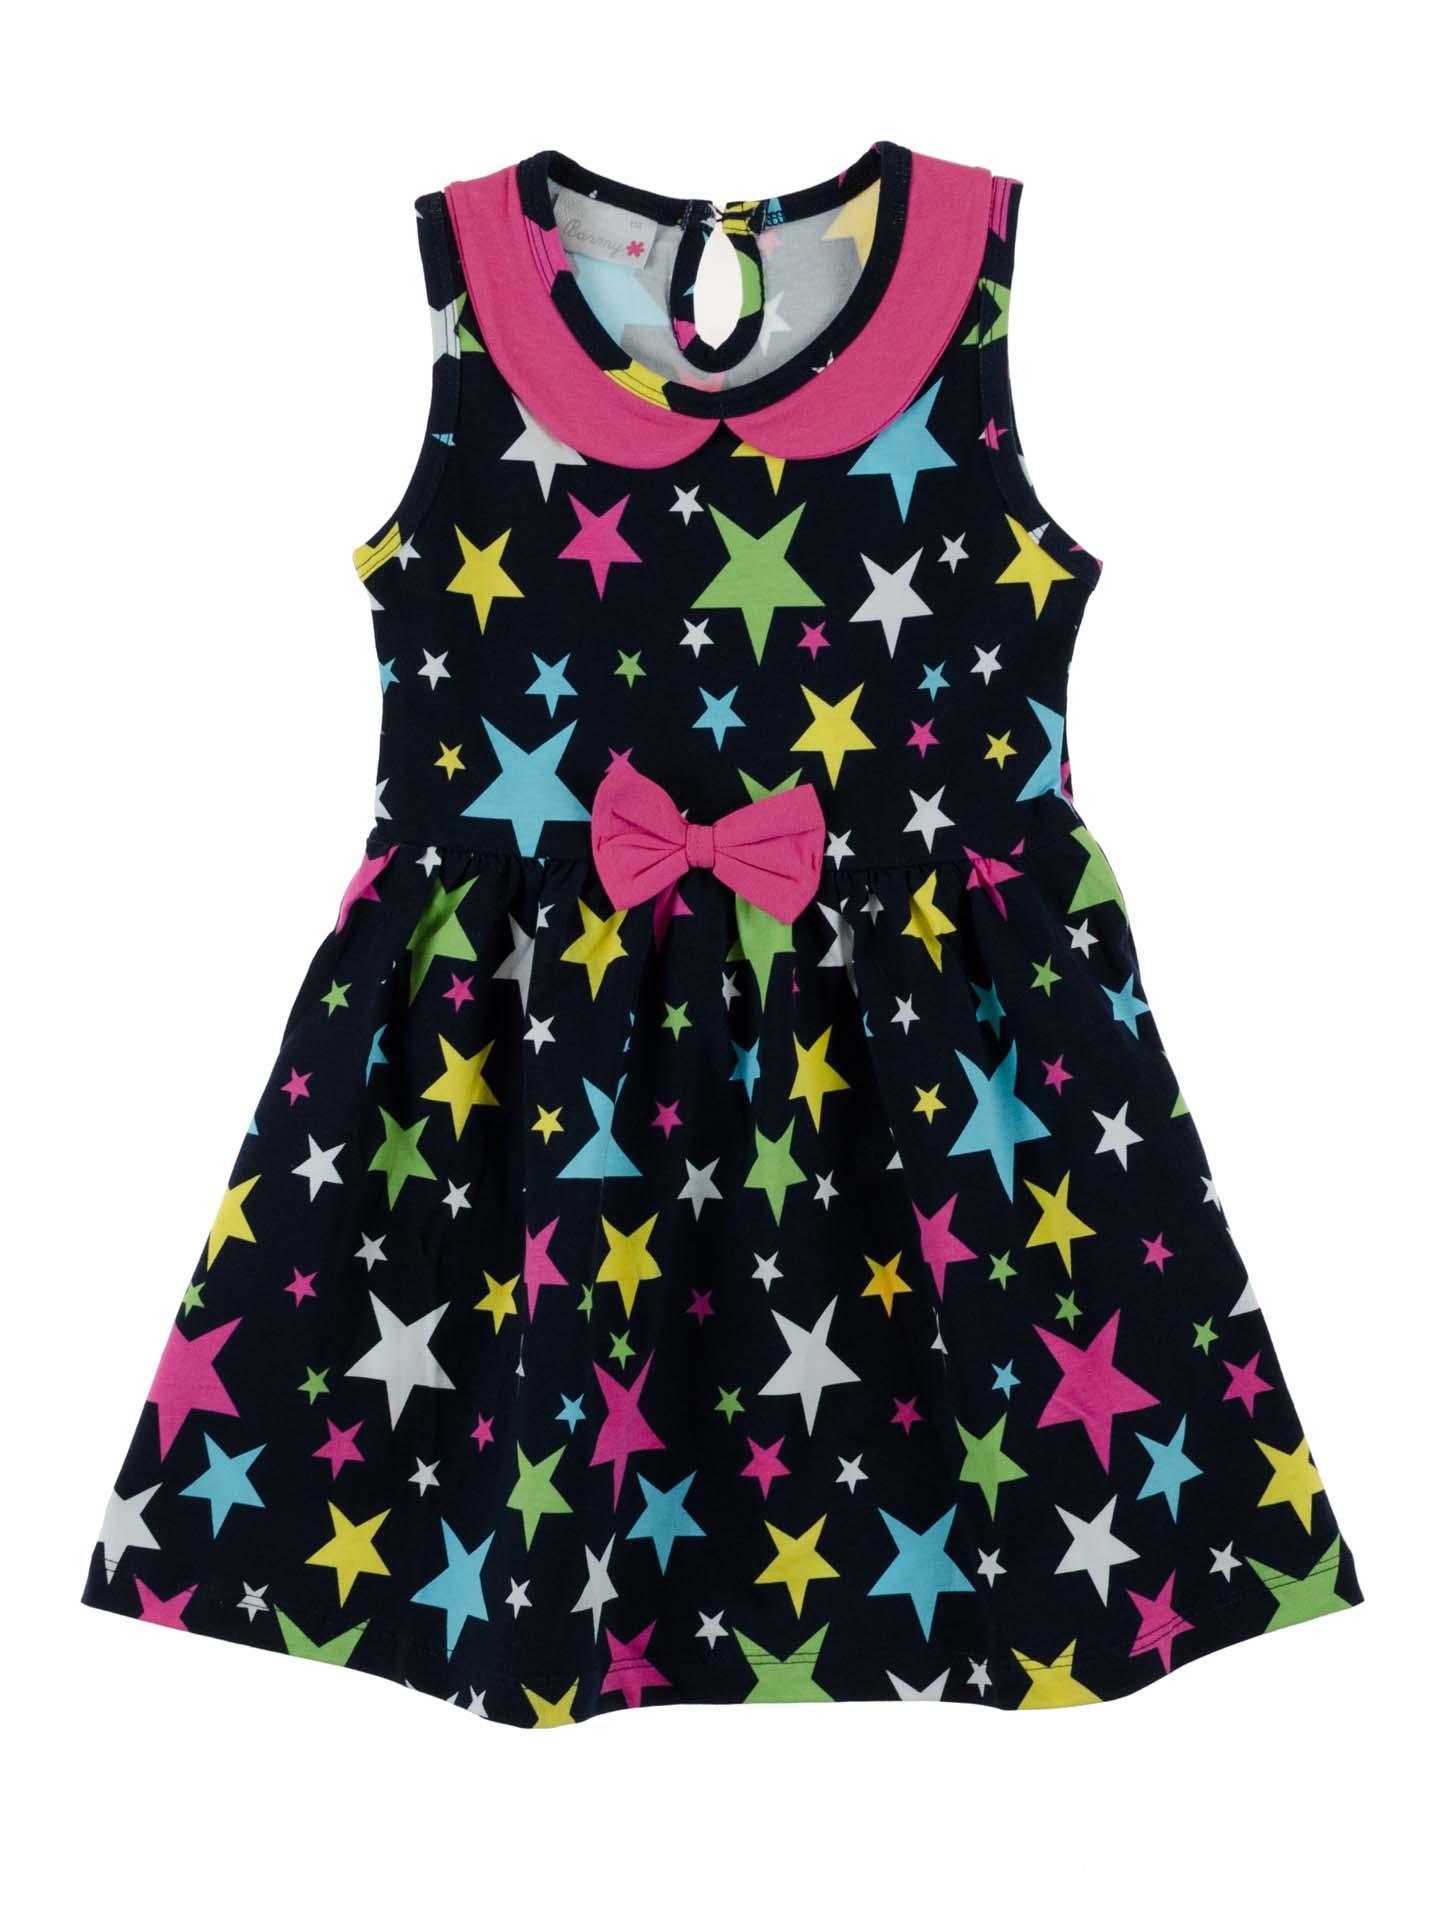 Купити Святкова сукня для дівчинки  336e4626a77e8